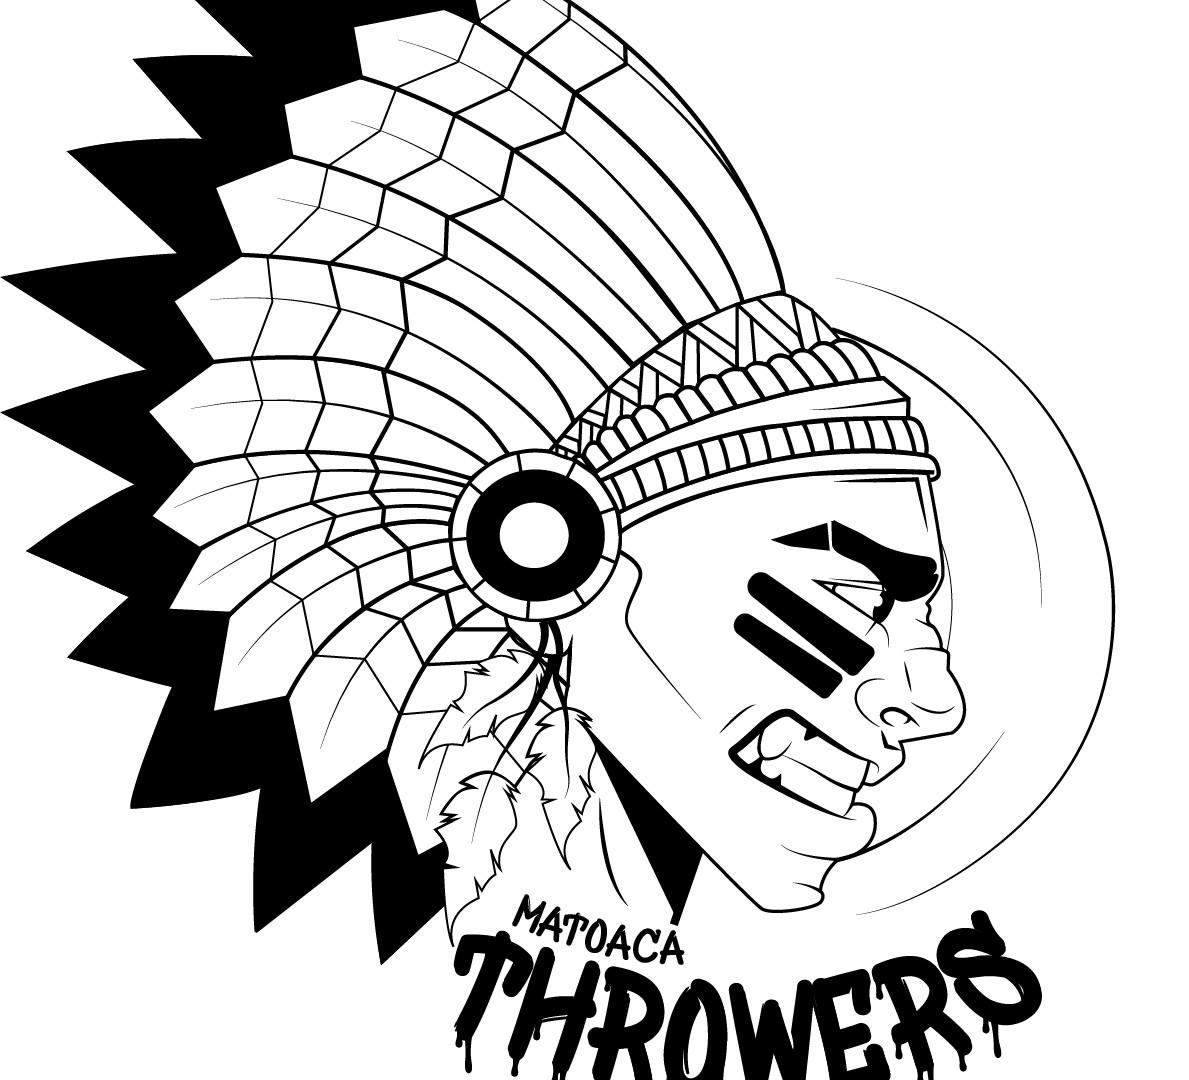 T-shirt design for my high school throwing team